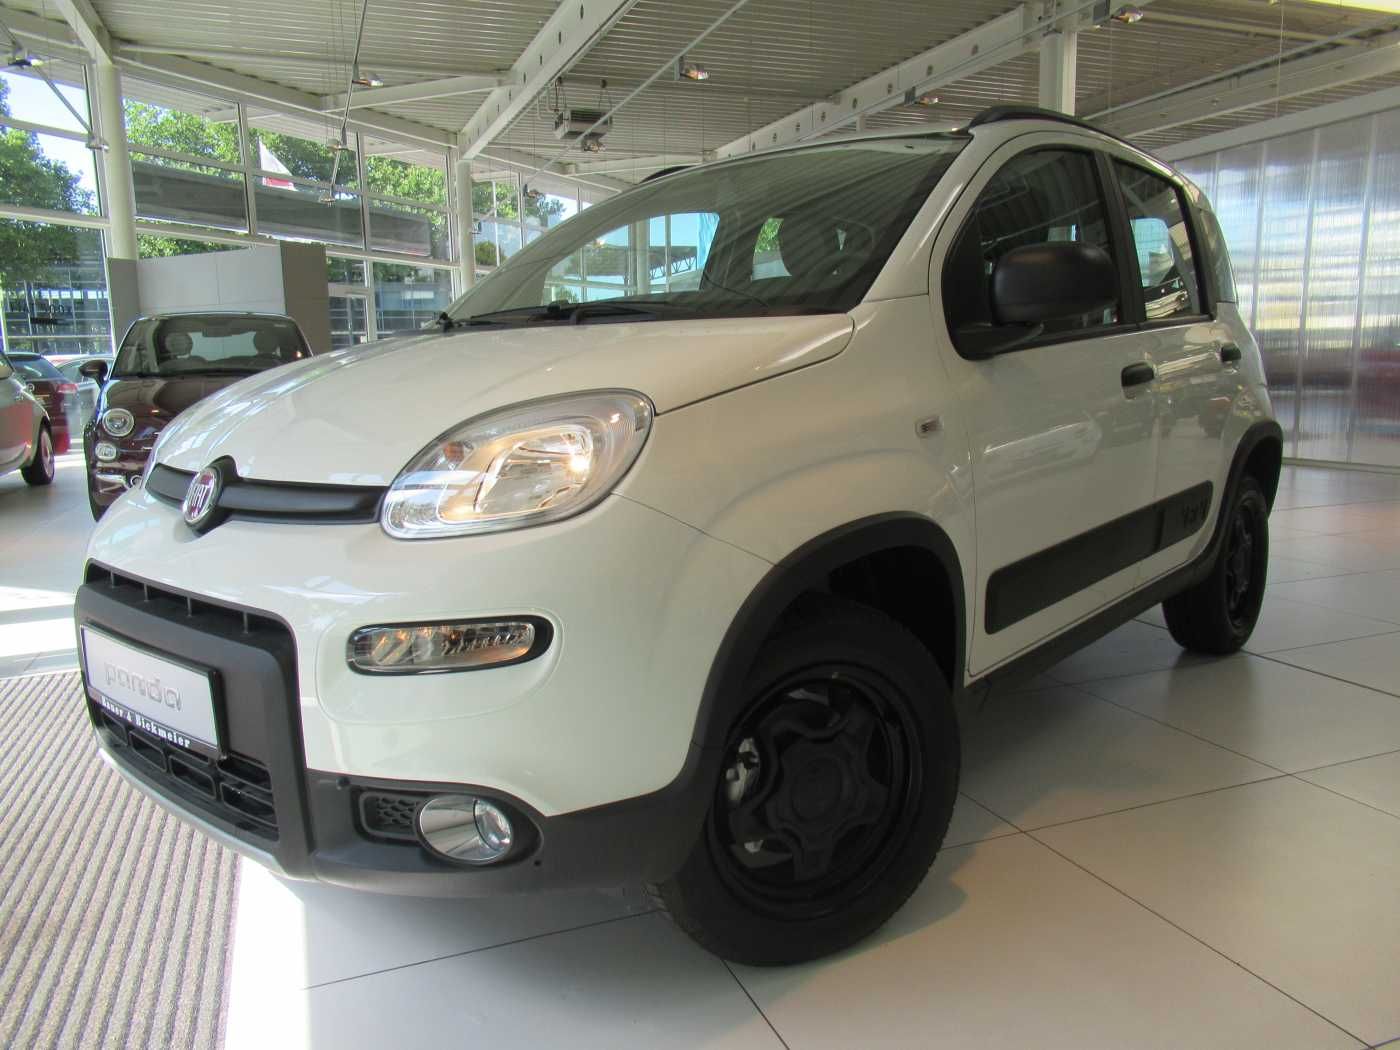 Fiat Panda 0.9 Twinair 4x4 Wild SITZHEIZUNG+NEBEL, Jahr 2020, Benzin